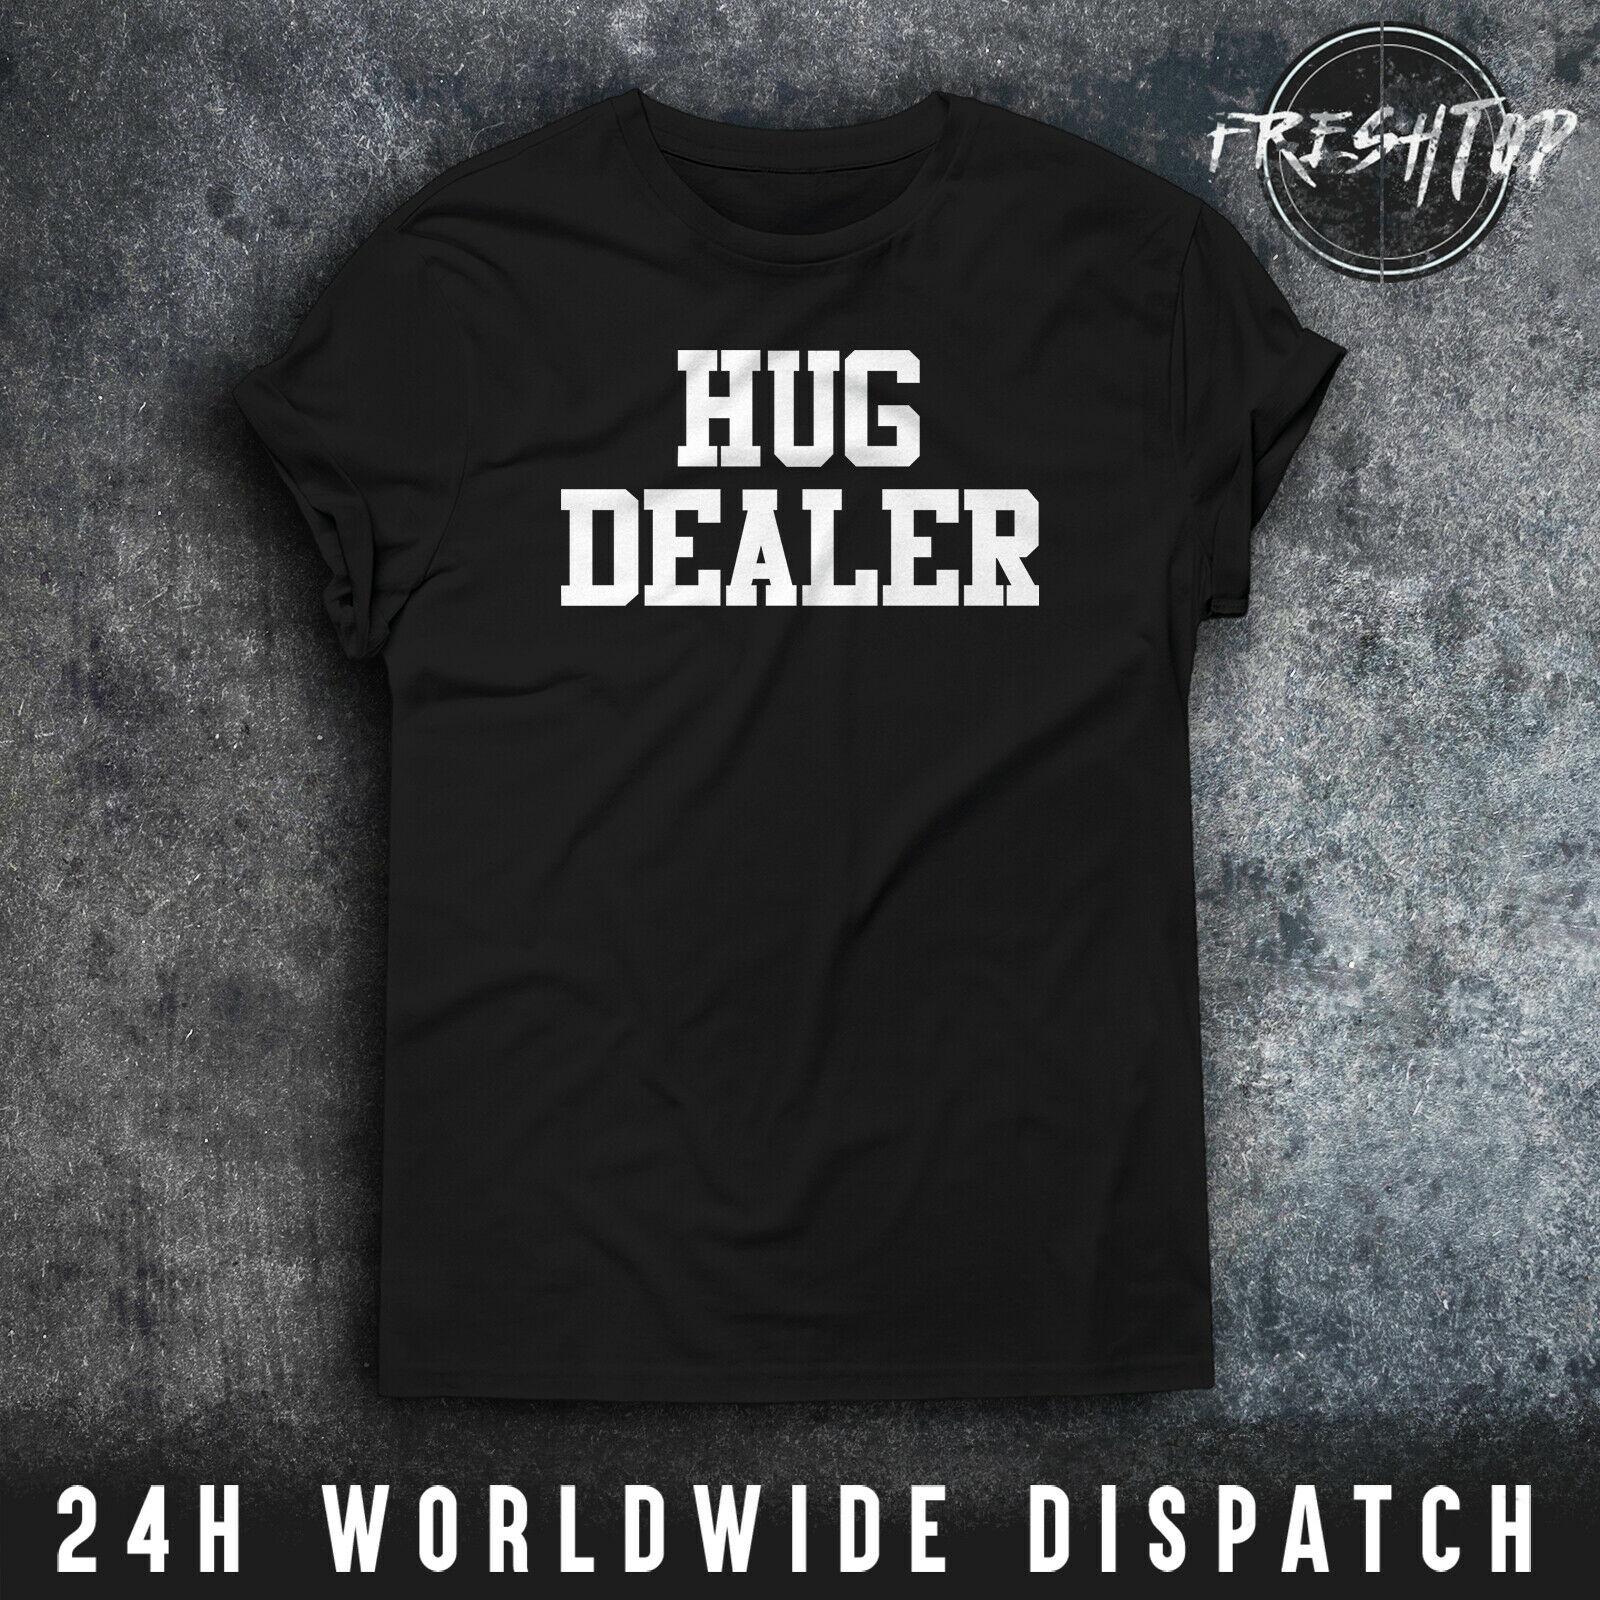 Hug Dealer T Shirt Free Hug Love Peace Open Minded Person Namaste Friends